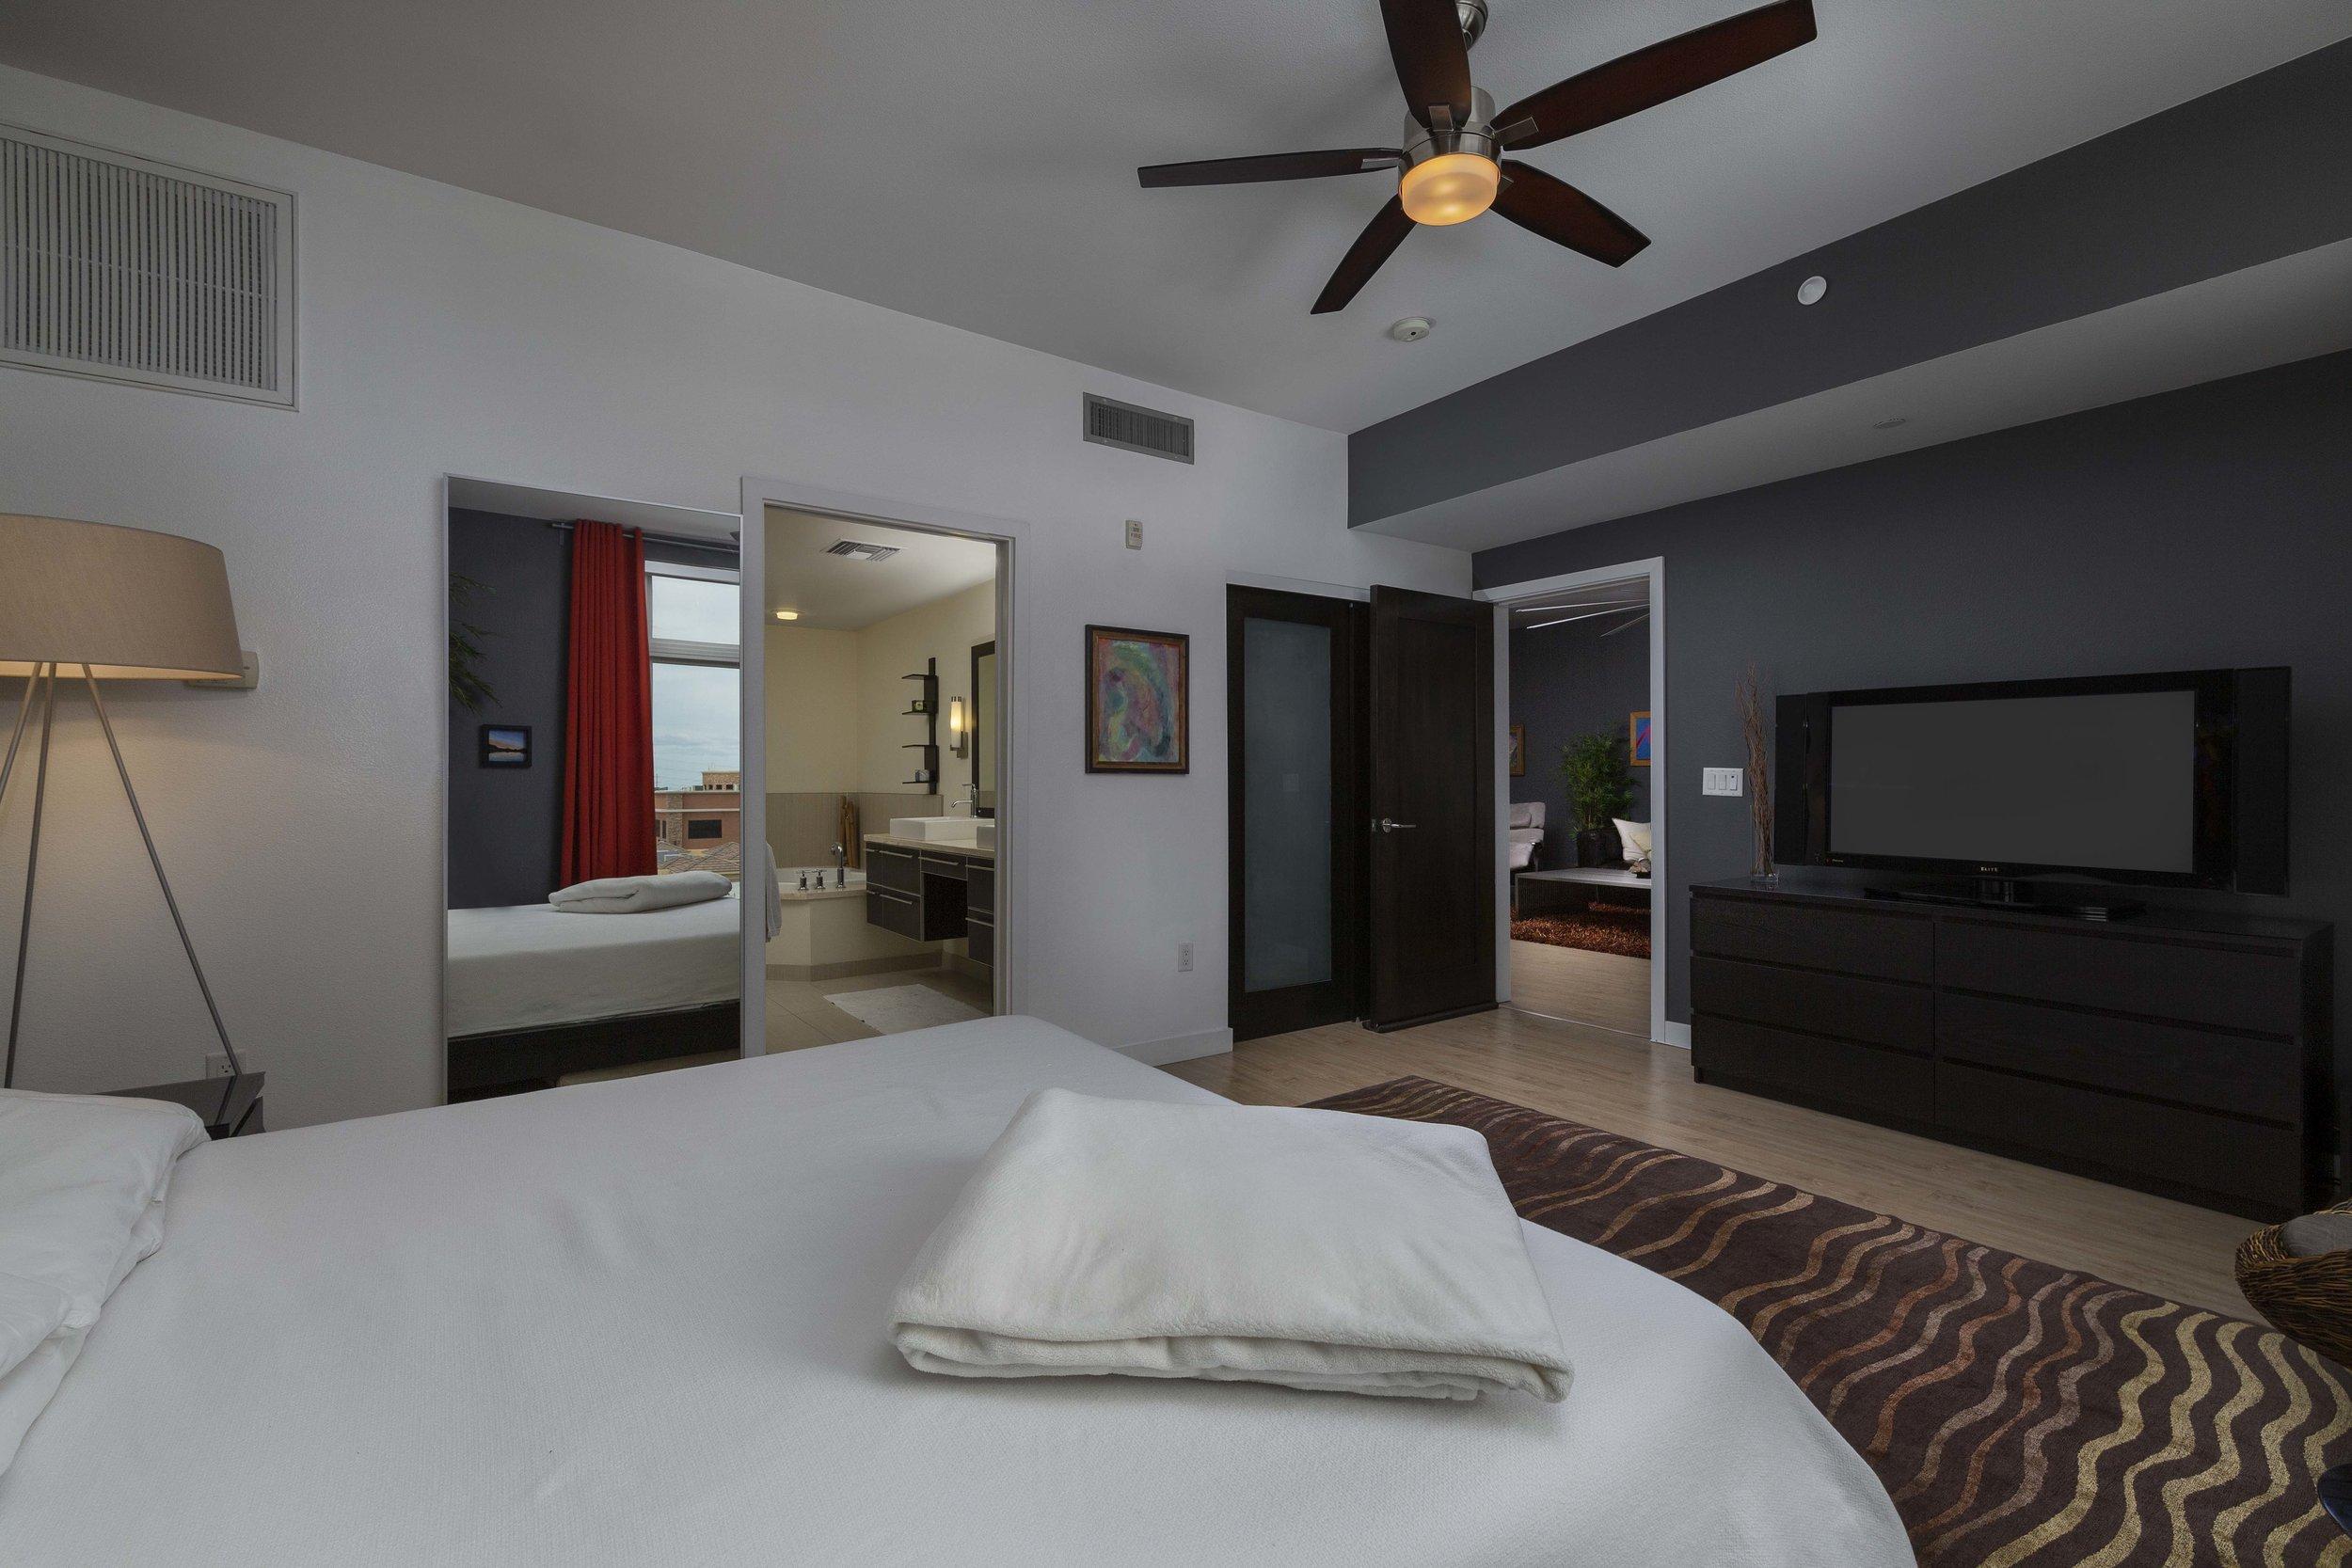 Bedroom_005.jpg